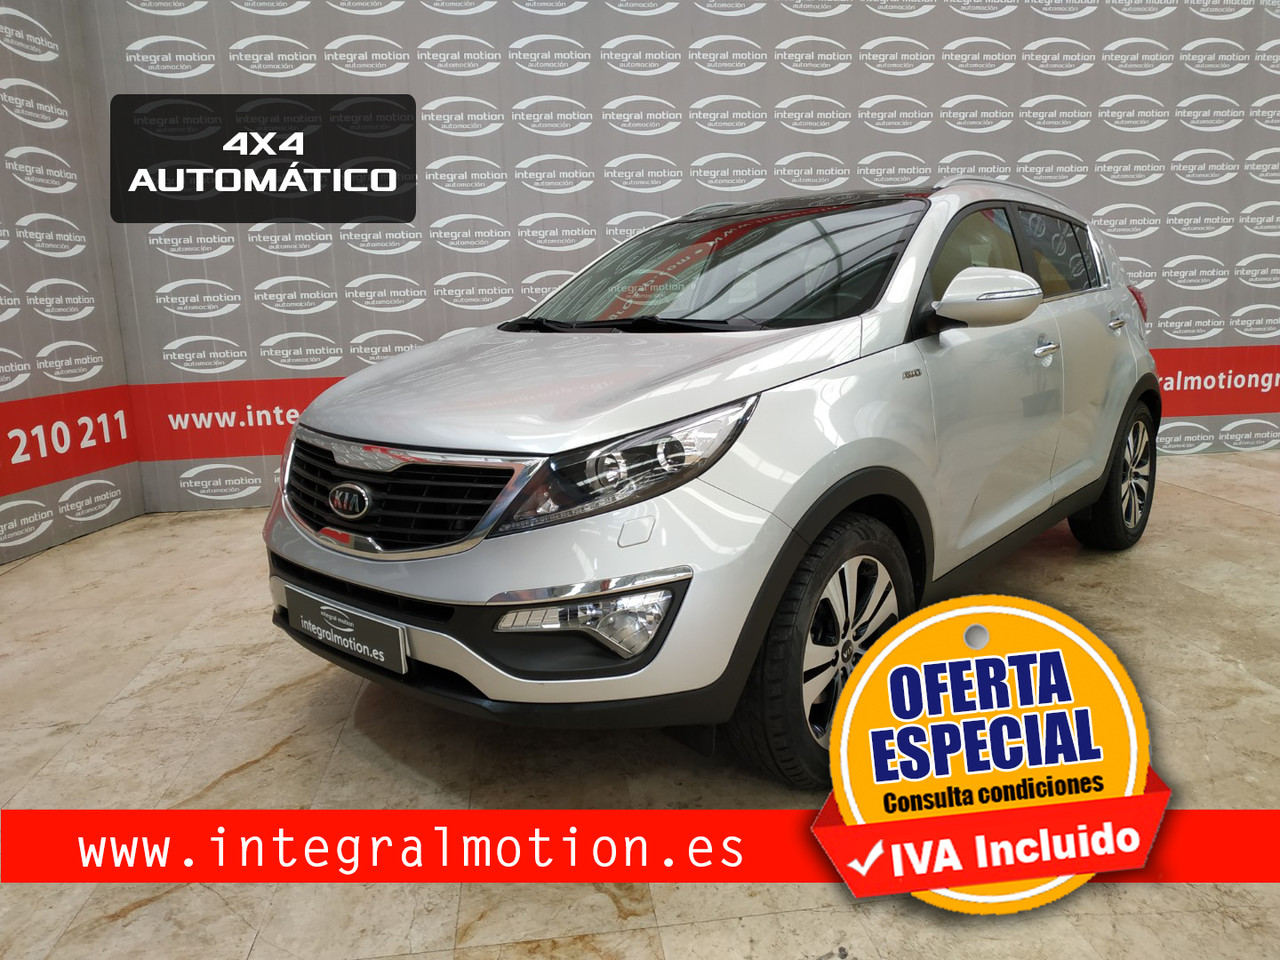 Kia Sportage 2.0 CRDI VGT Emotion Auto 4x4 136cv  - Foto 1